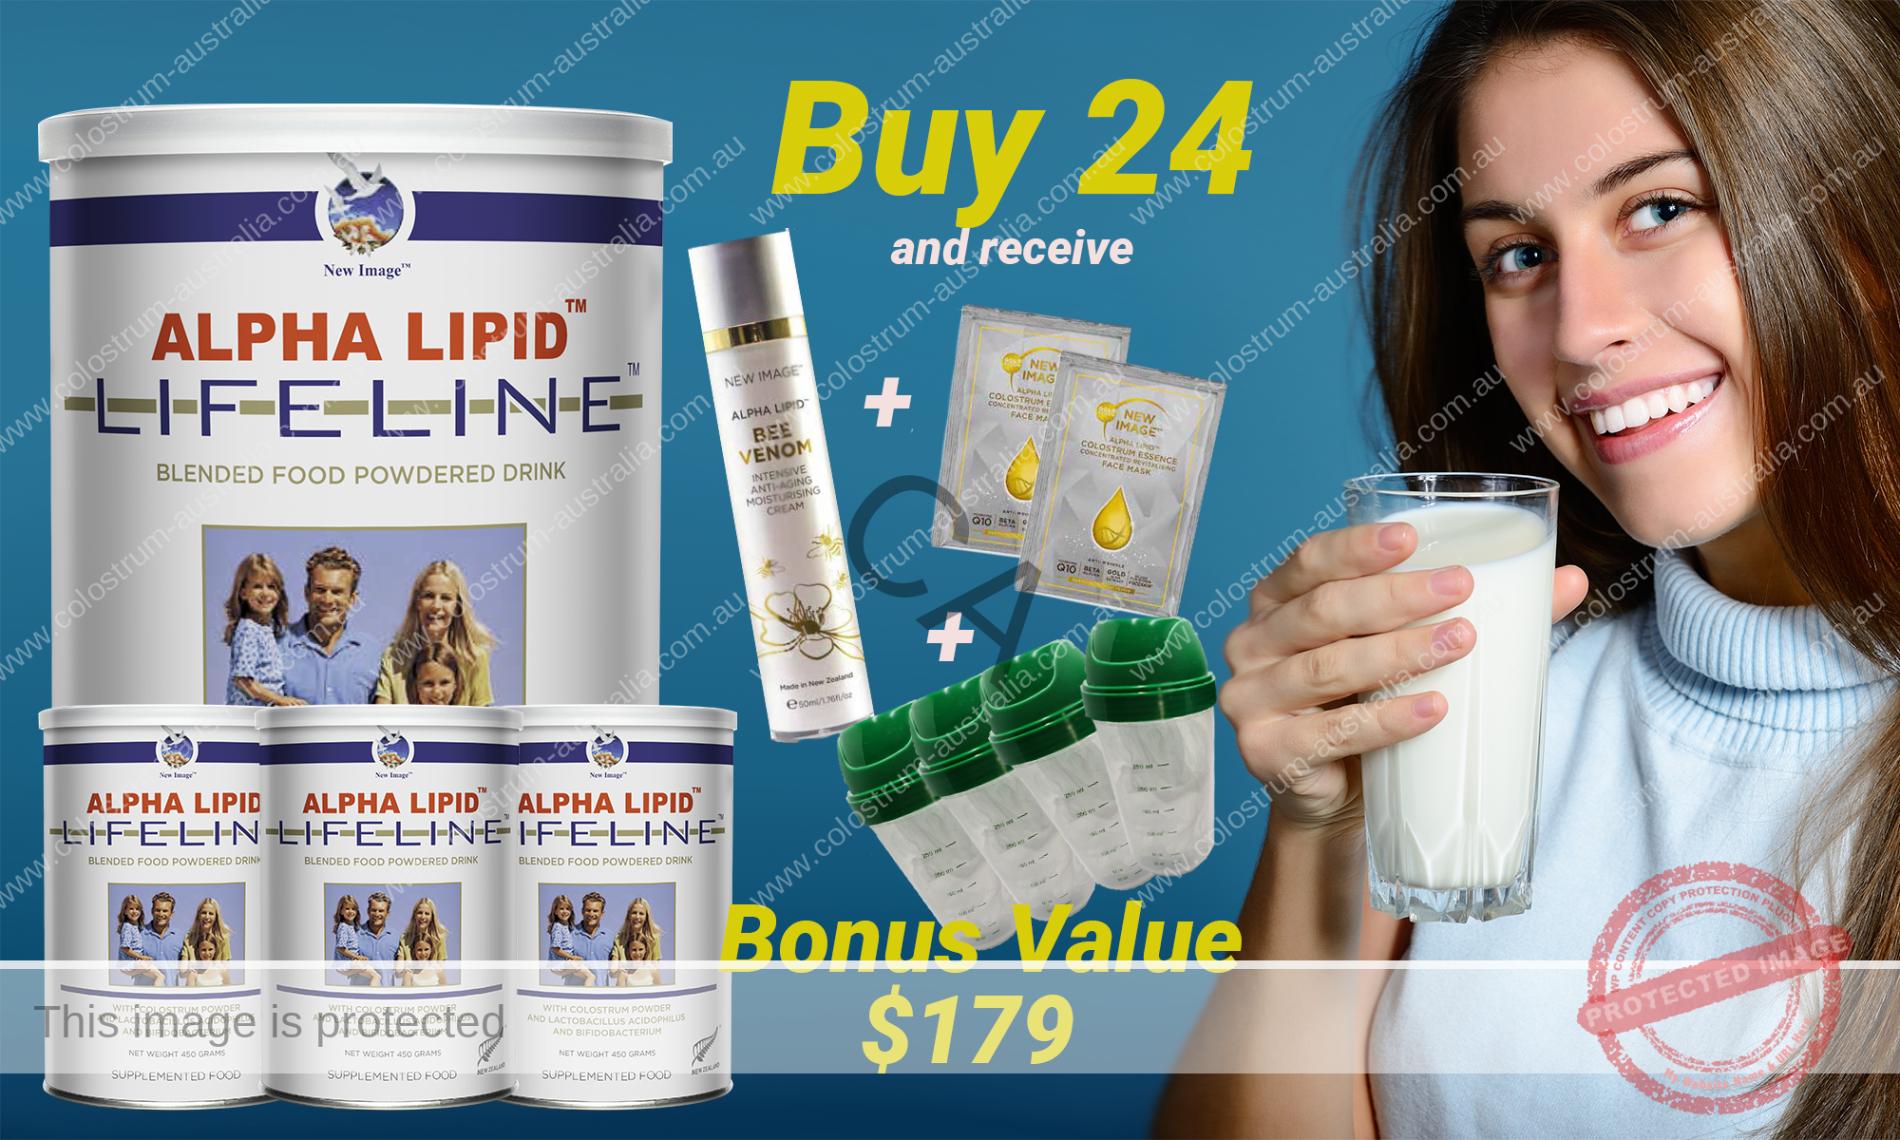 Alpha Lipid Lifeline Colostrum 24 can buy with Bonus